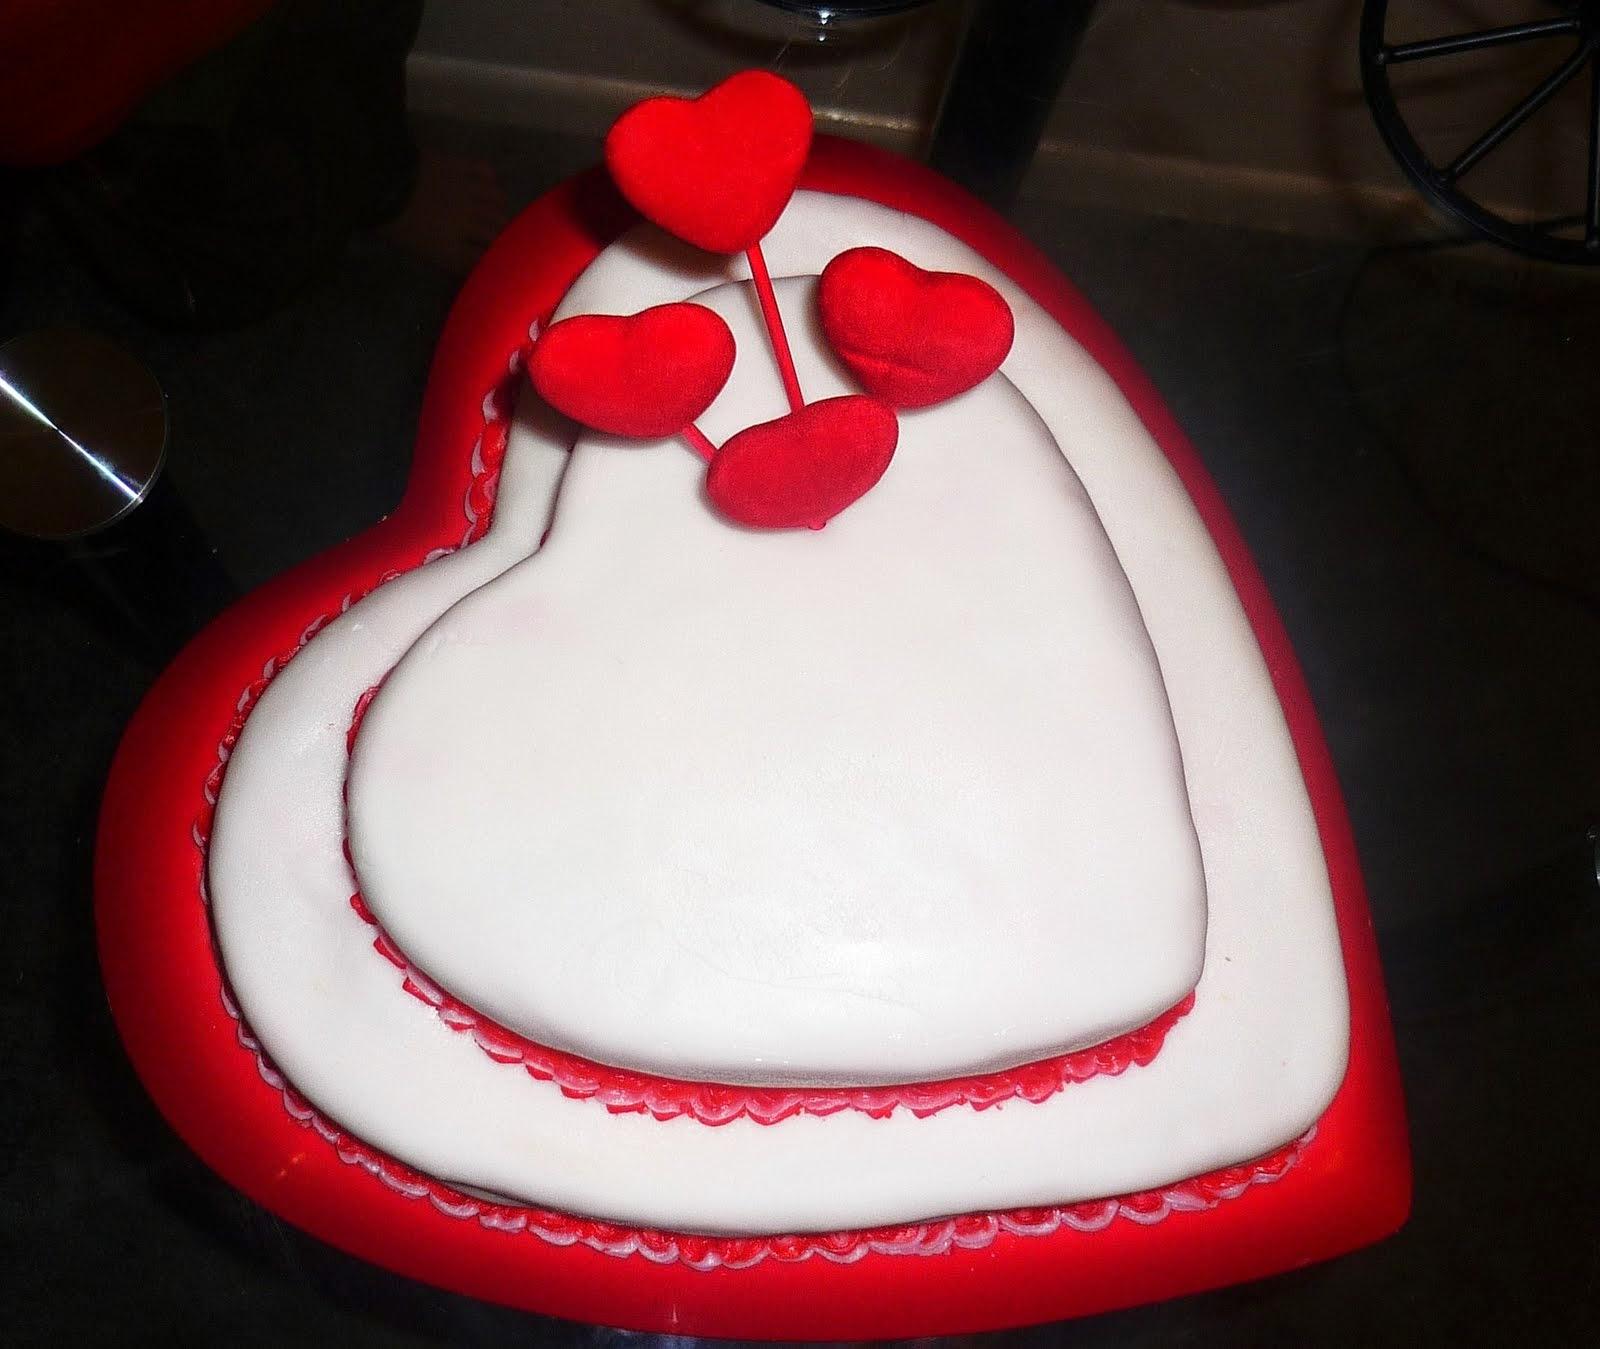 HD BIRTHDAY WALLPAPER : Birthday Cakes